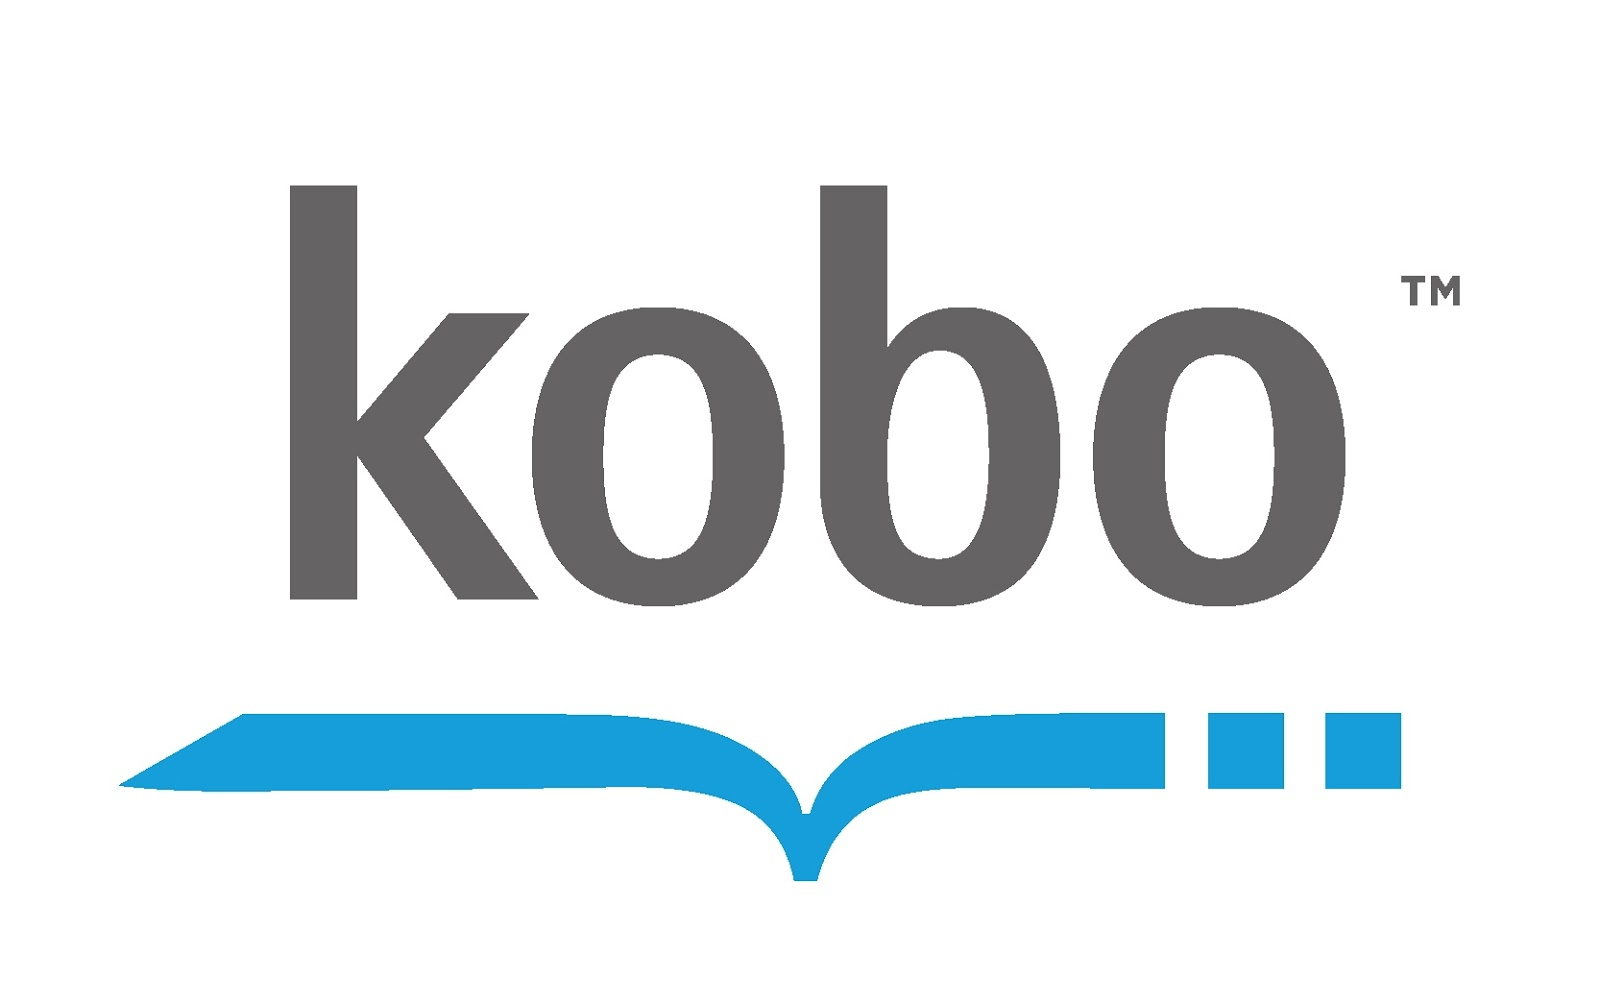 http://store.kobobooks.com/en-US/ebook/uncomplicated-a-vegas-girl-s-tale